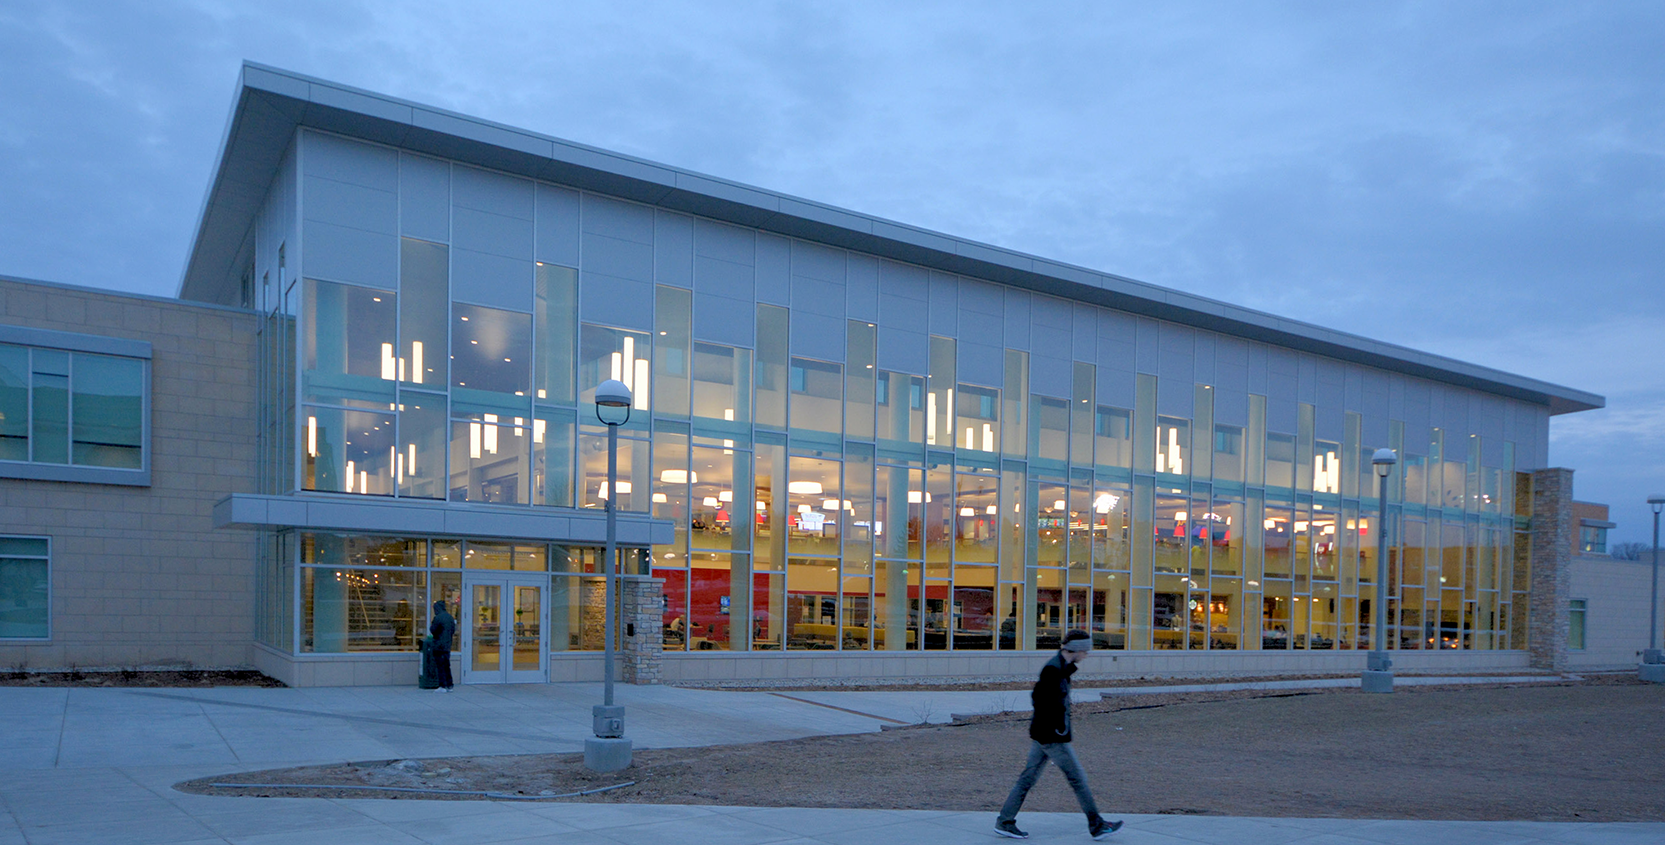 Ferris-State-University-University-Center-Exterior-Dusk-1665x845